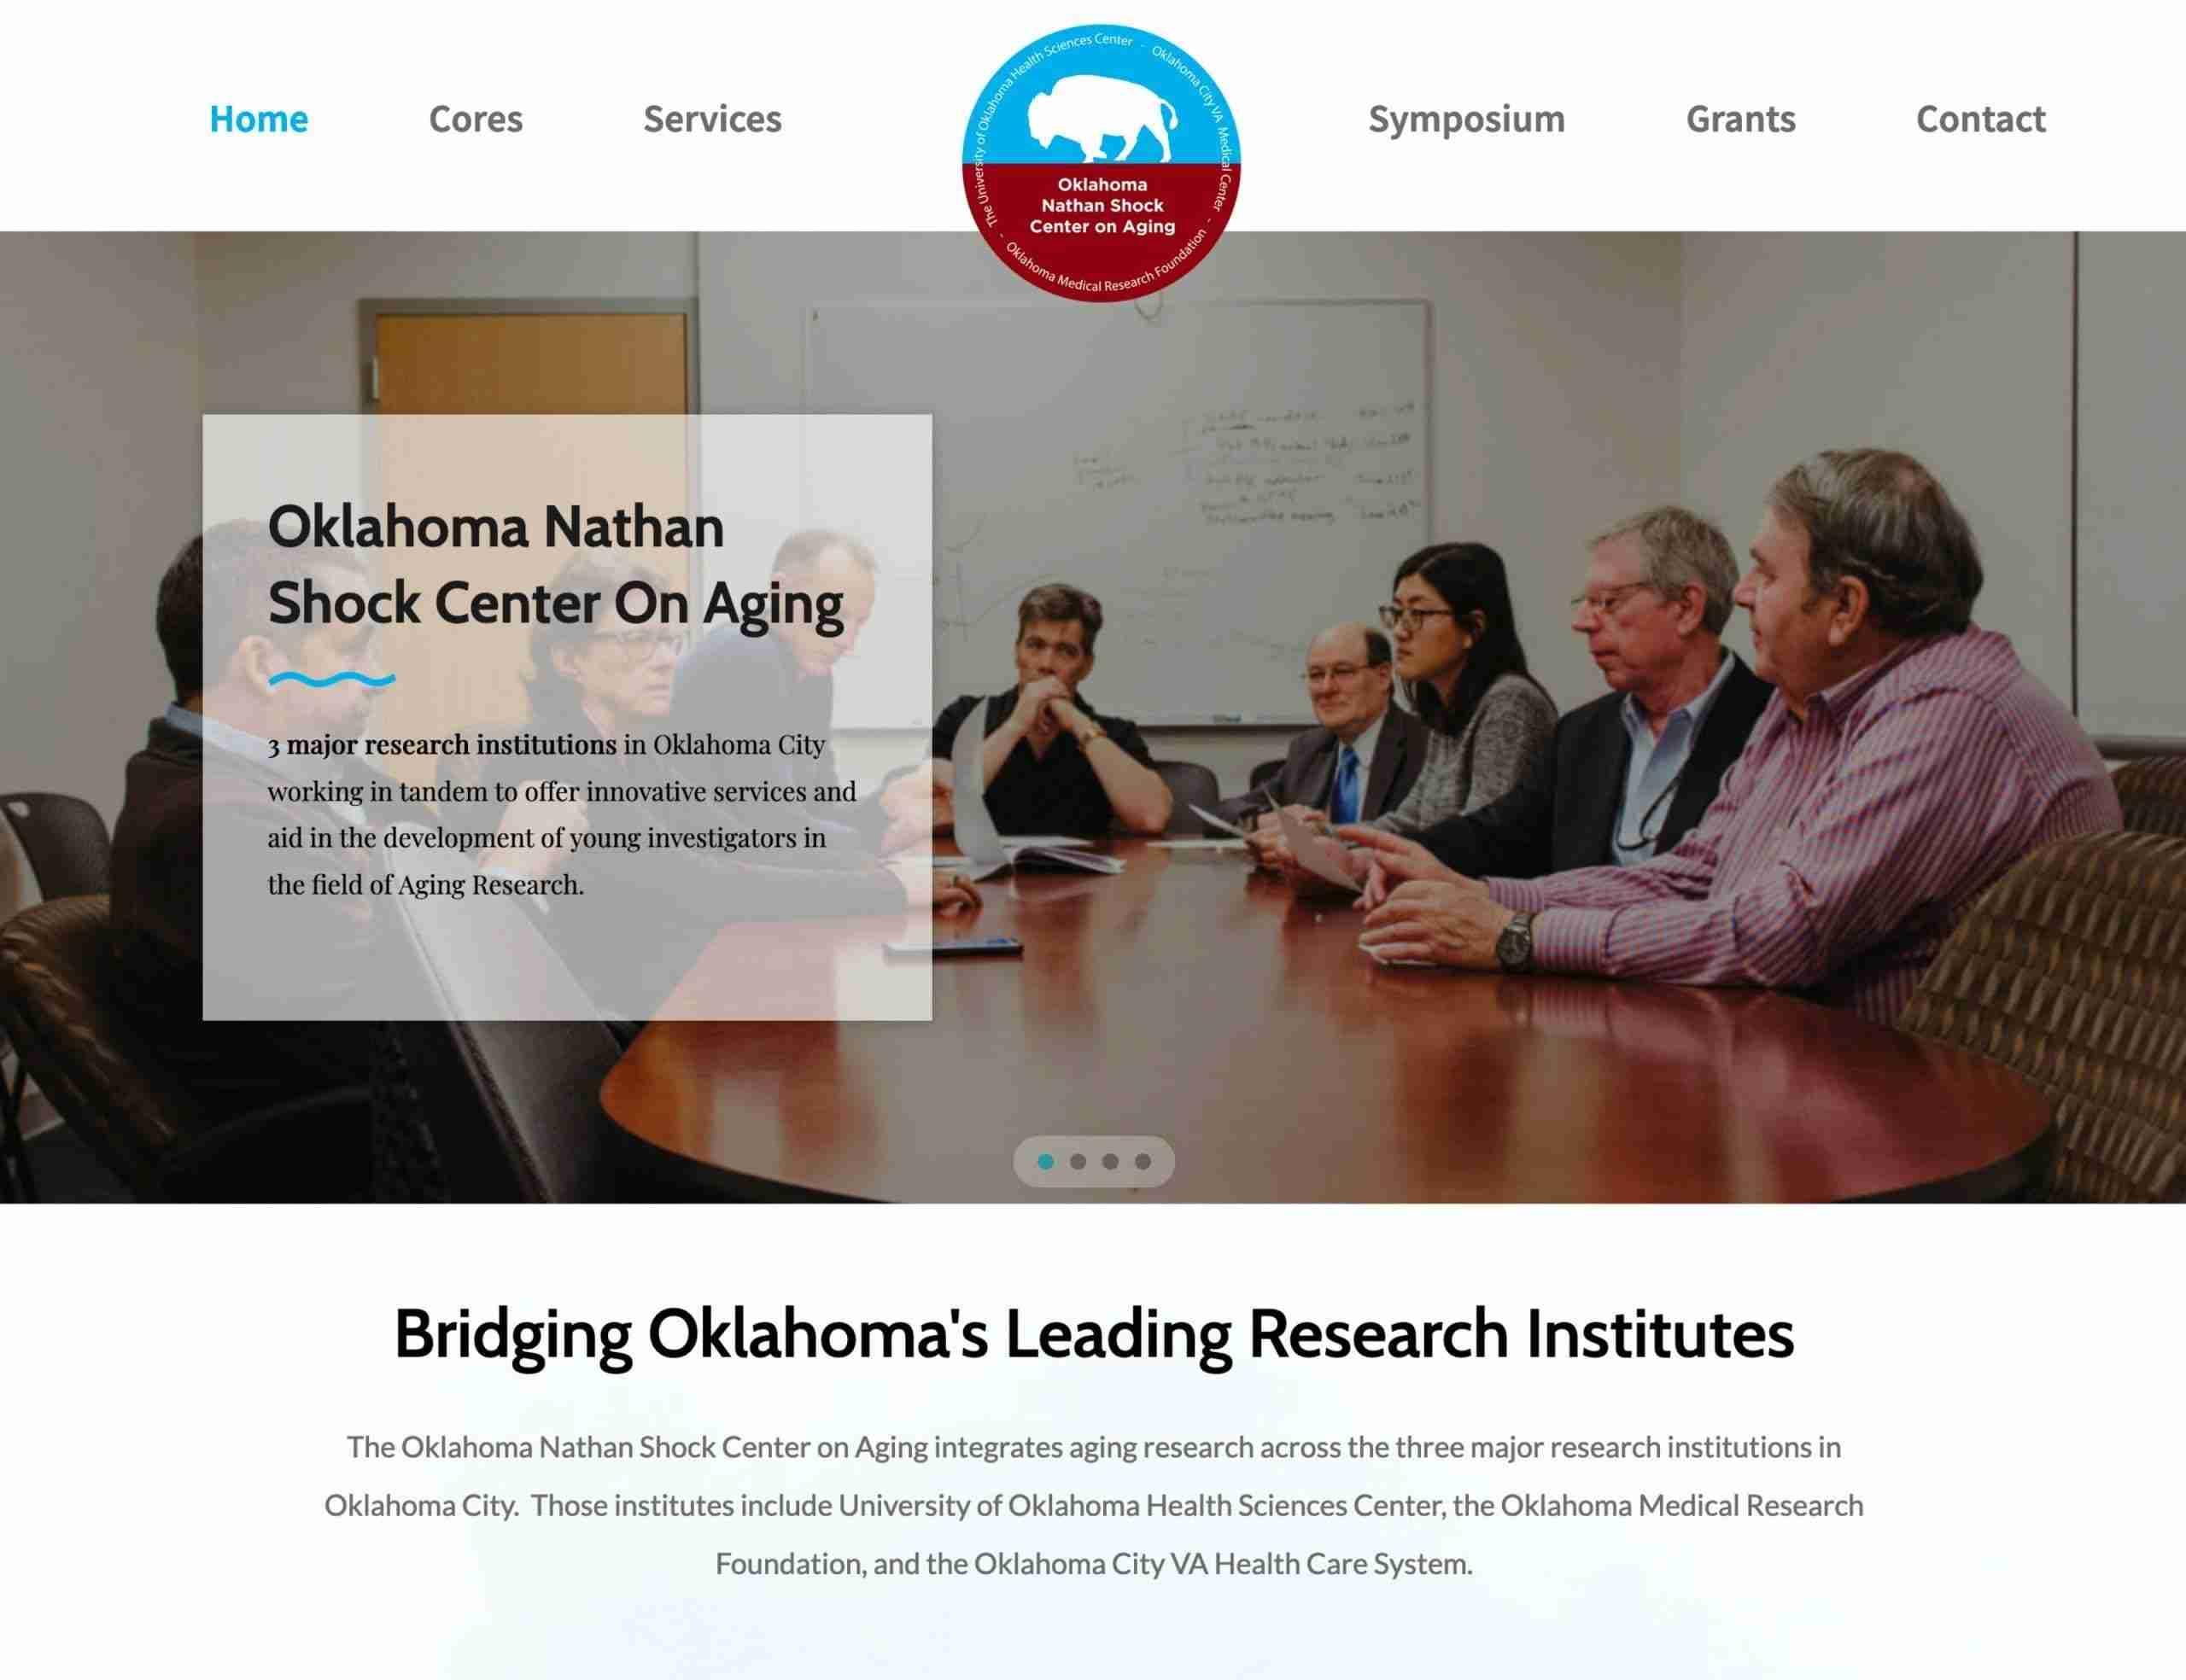 Oklahoma Nathan Shock Center On Aging